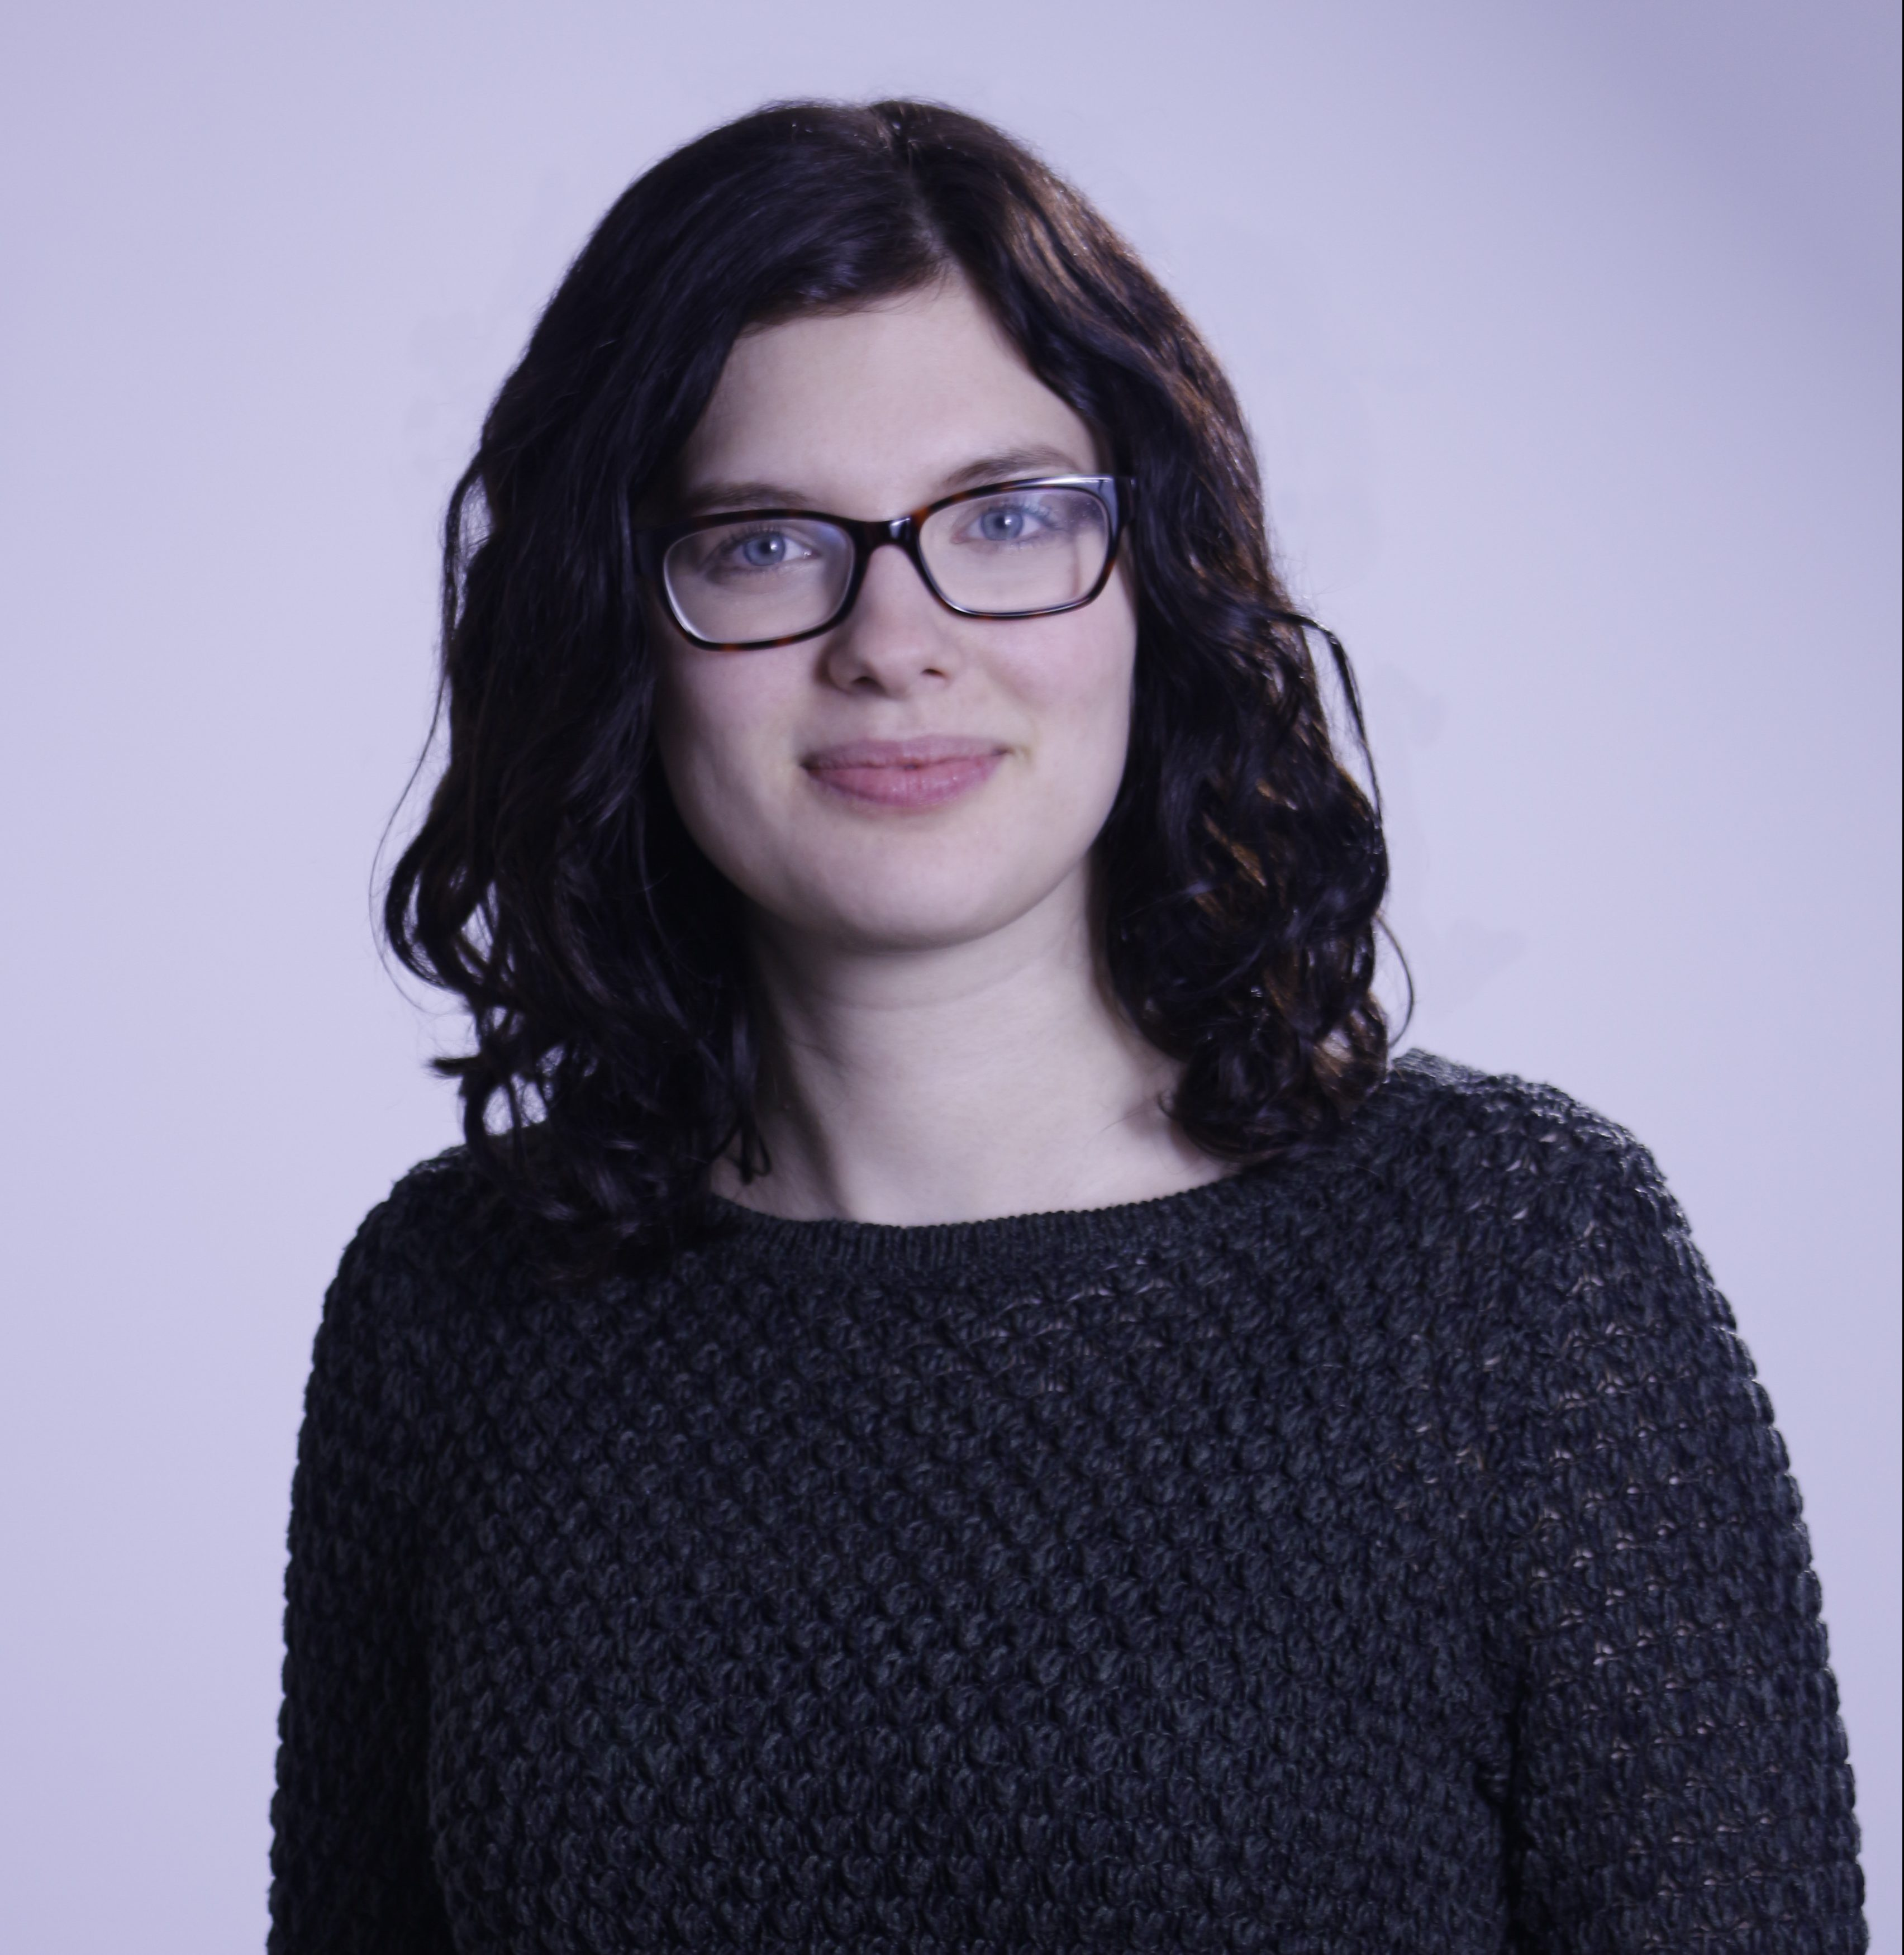 Juliane Wendt